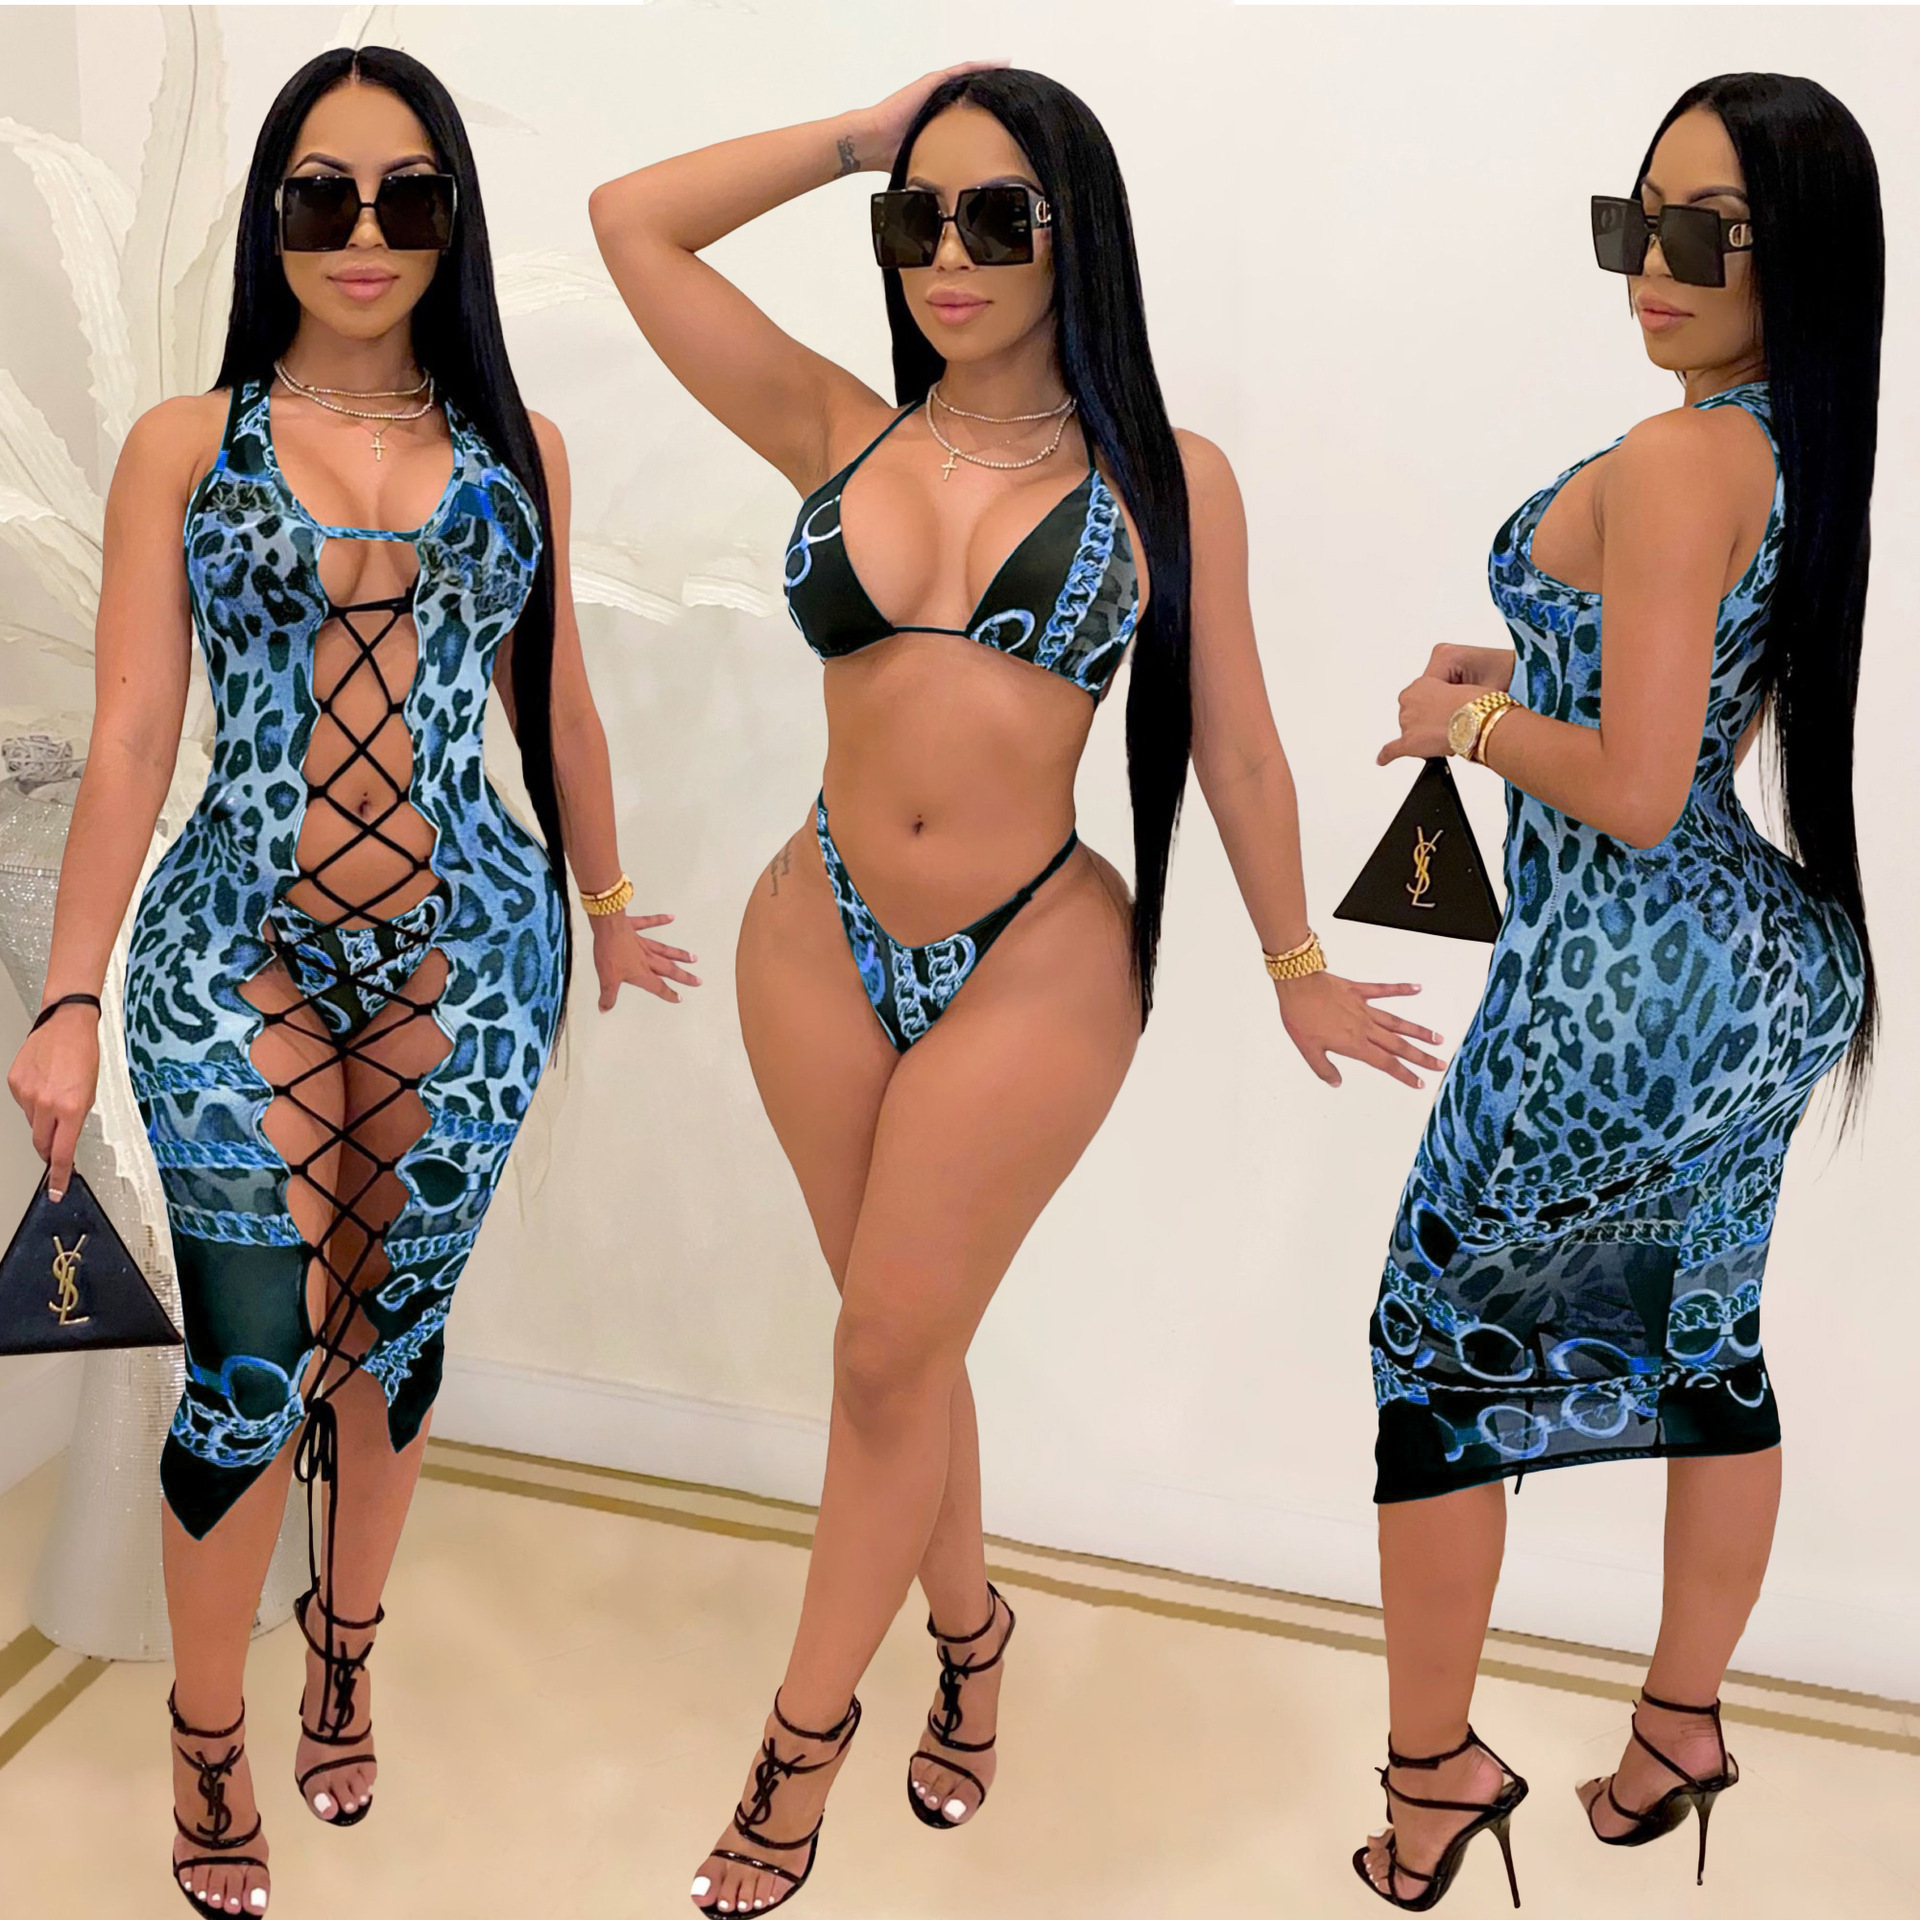 2021 Fashion Bikini Set And Matching Cover Dress Womens Sleeveless Hollow Out Laced Beach Dress 3 Pieces Outfits Beachwear S-XL 10